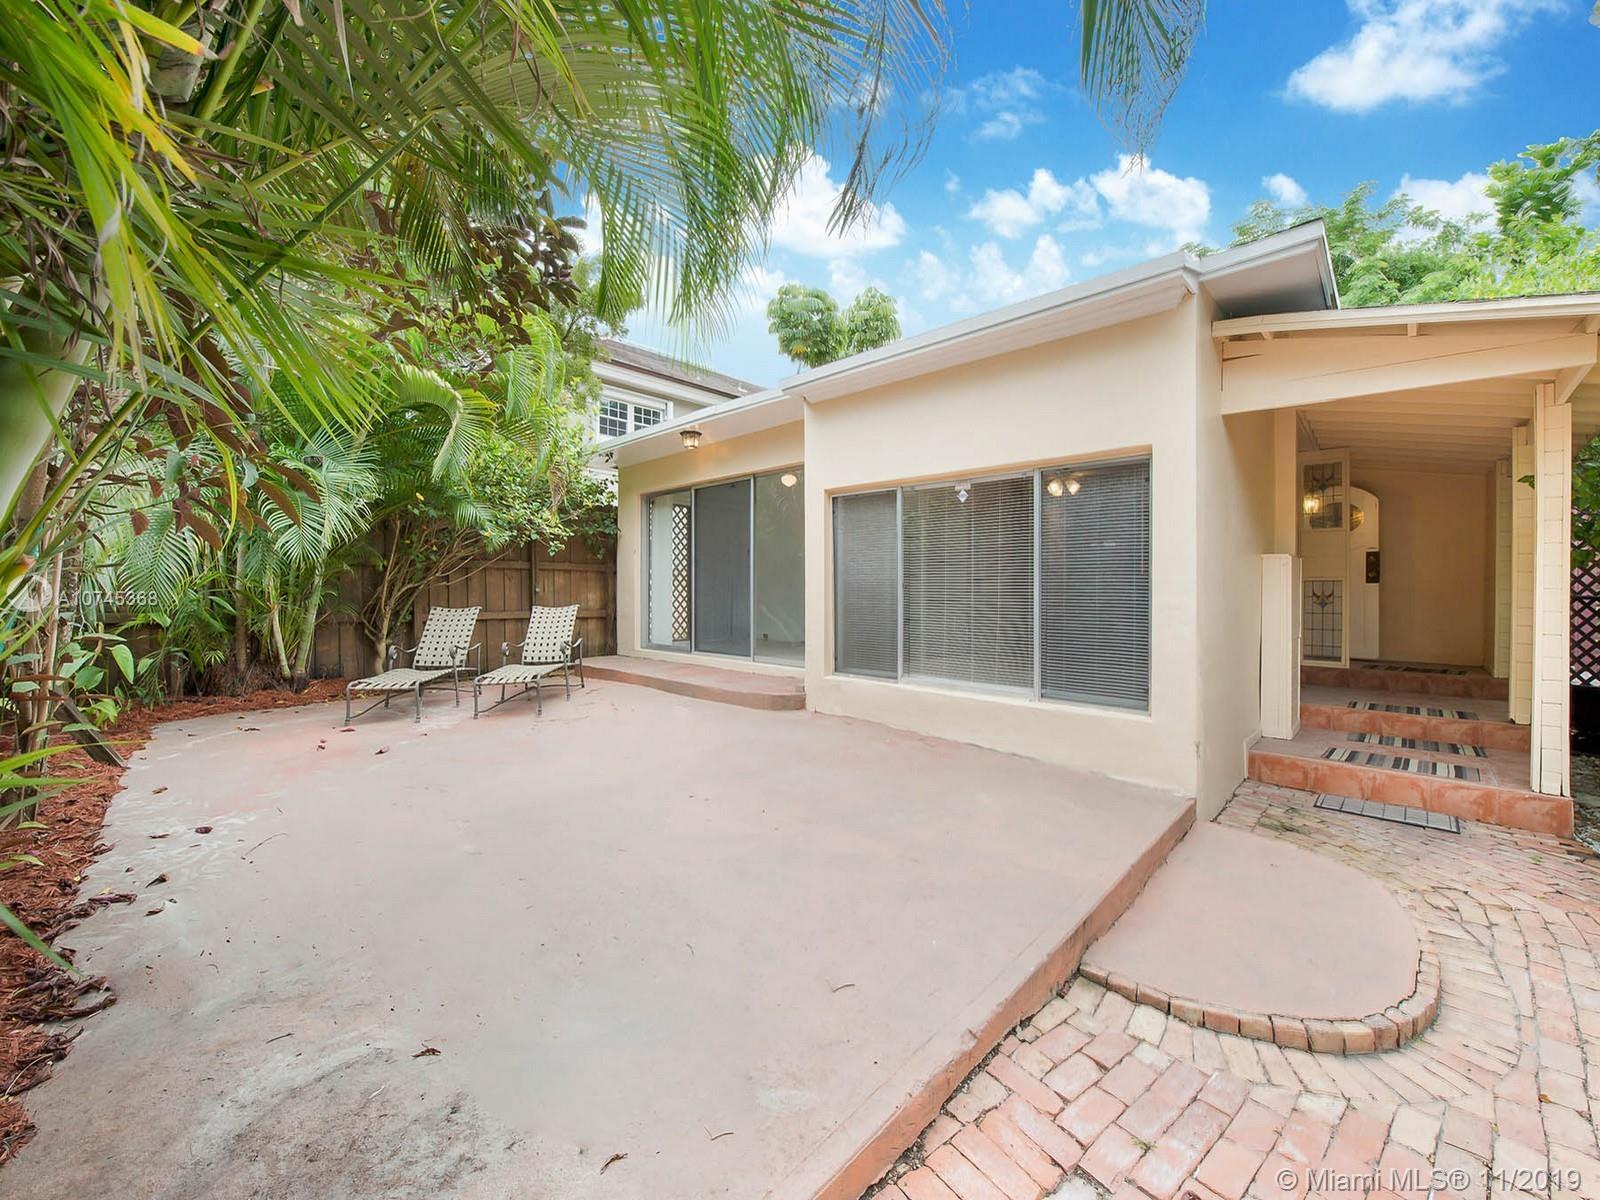 3166 Center Street, Miami FL 33133